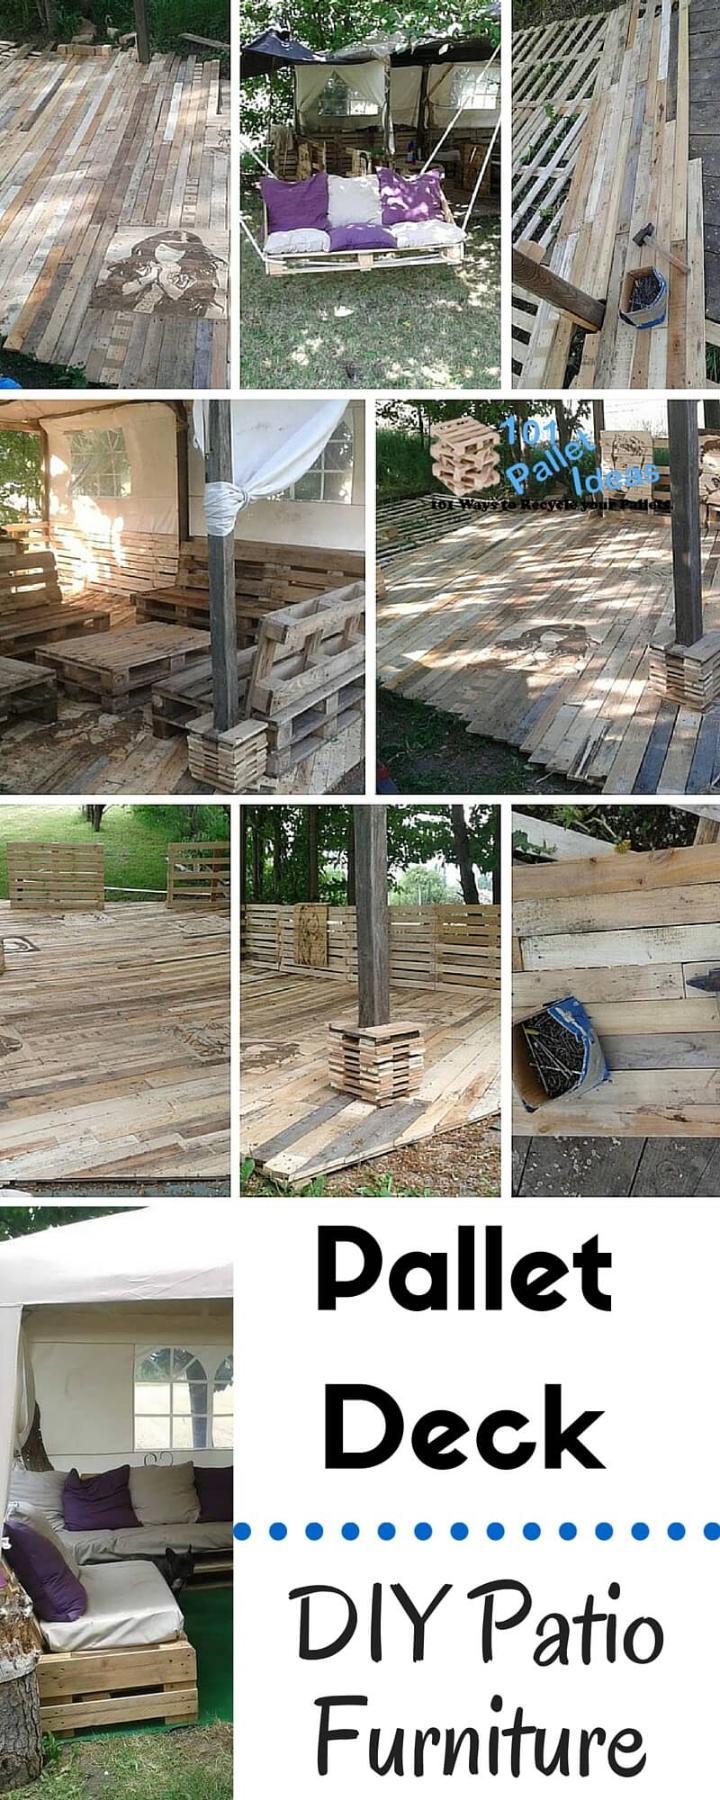 pallet deck construction diy patio